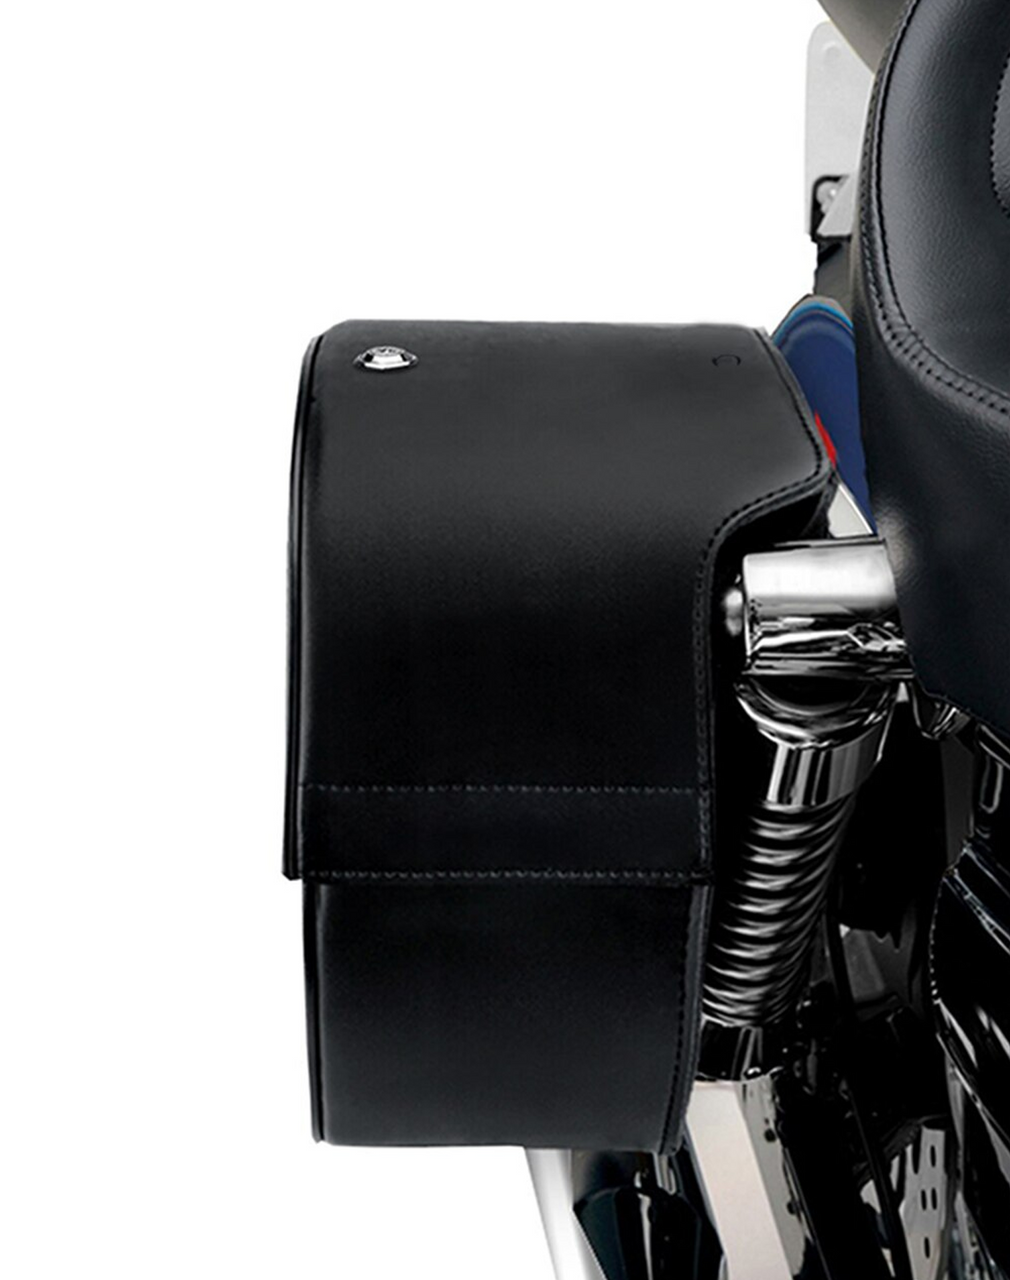 Honda VTX 1800 F SS Shock Cutout Slanted Studded Large Motorcycle Saddlebags Shock Cutout view